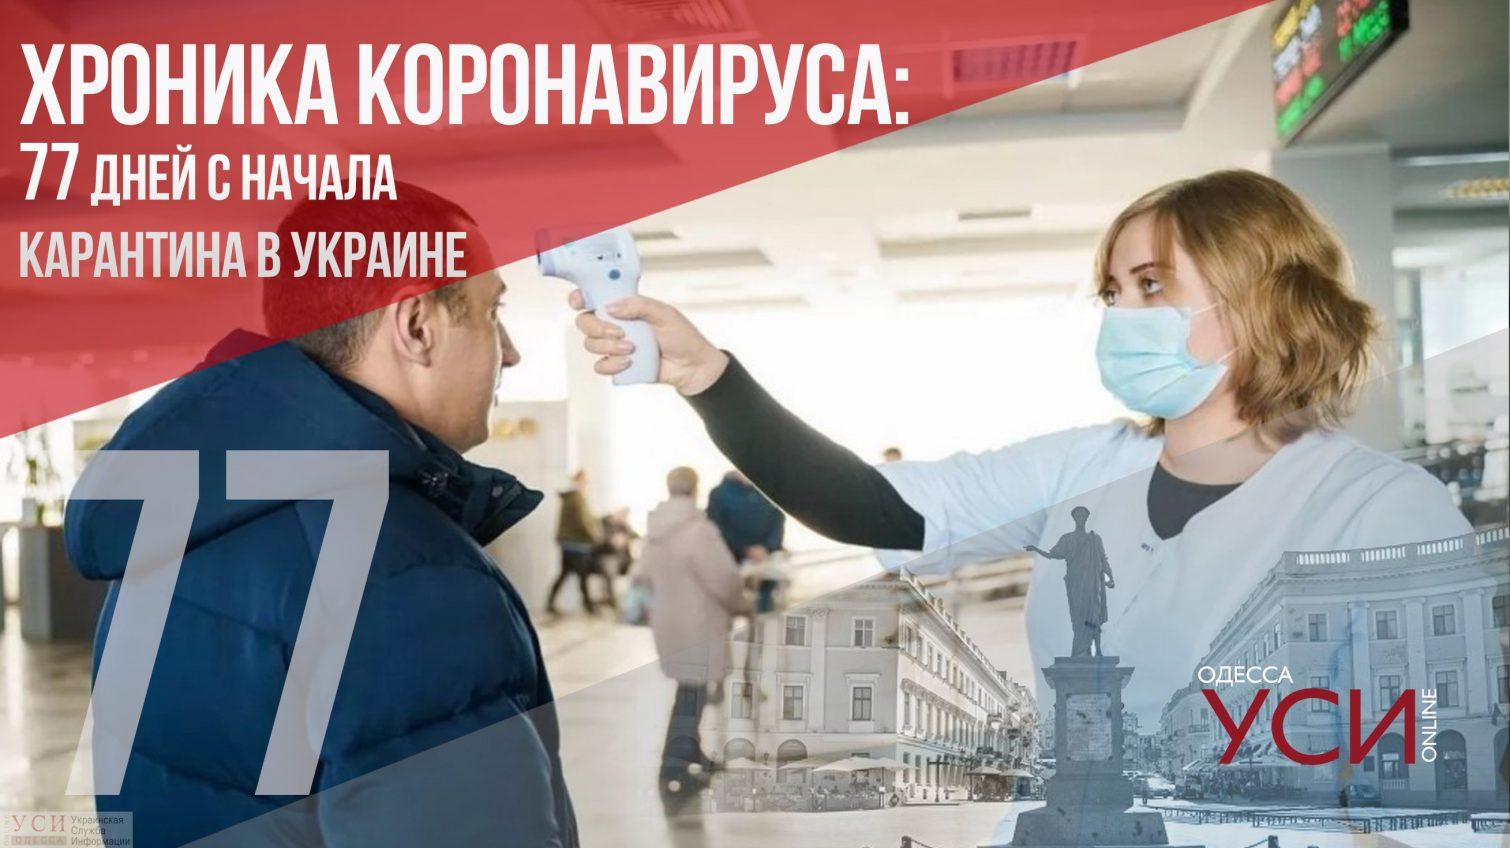 Хроника коронавируса: 77 дней с начала карантина в Украине ОБНОВЛЯЕТСЯ «фото»